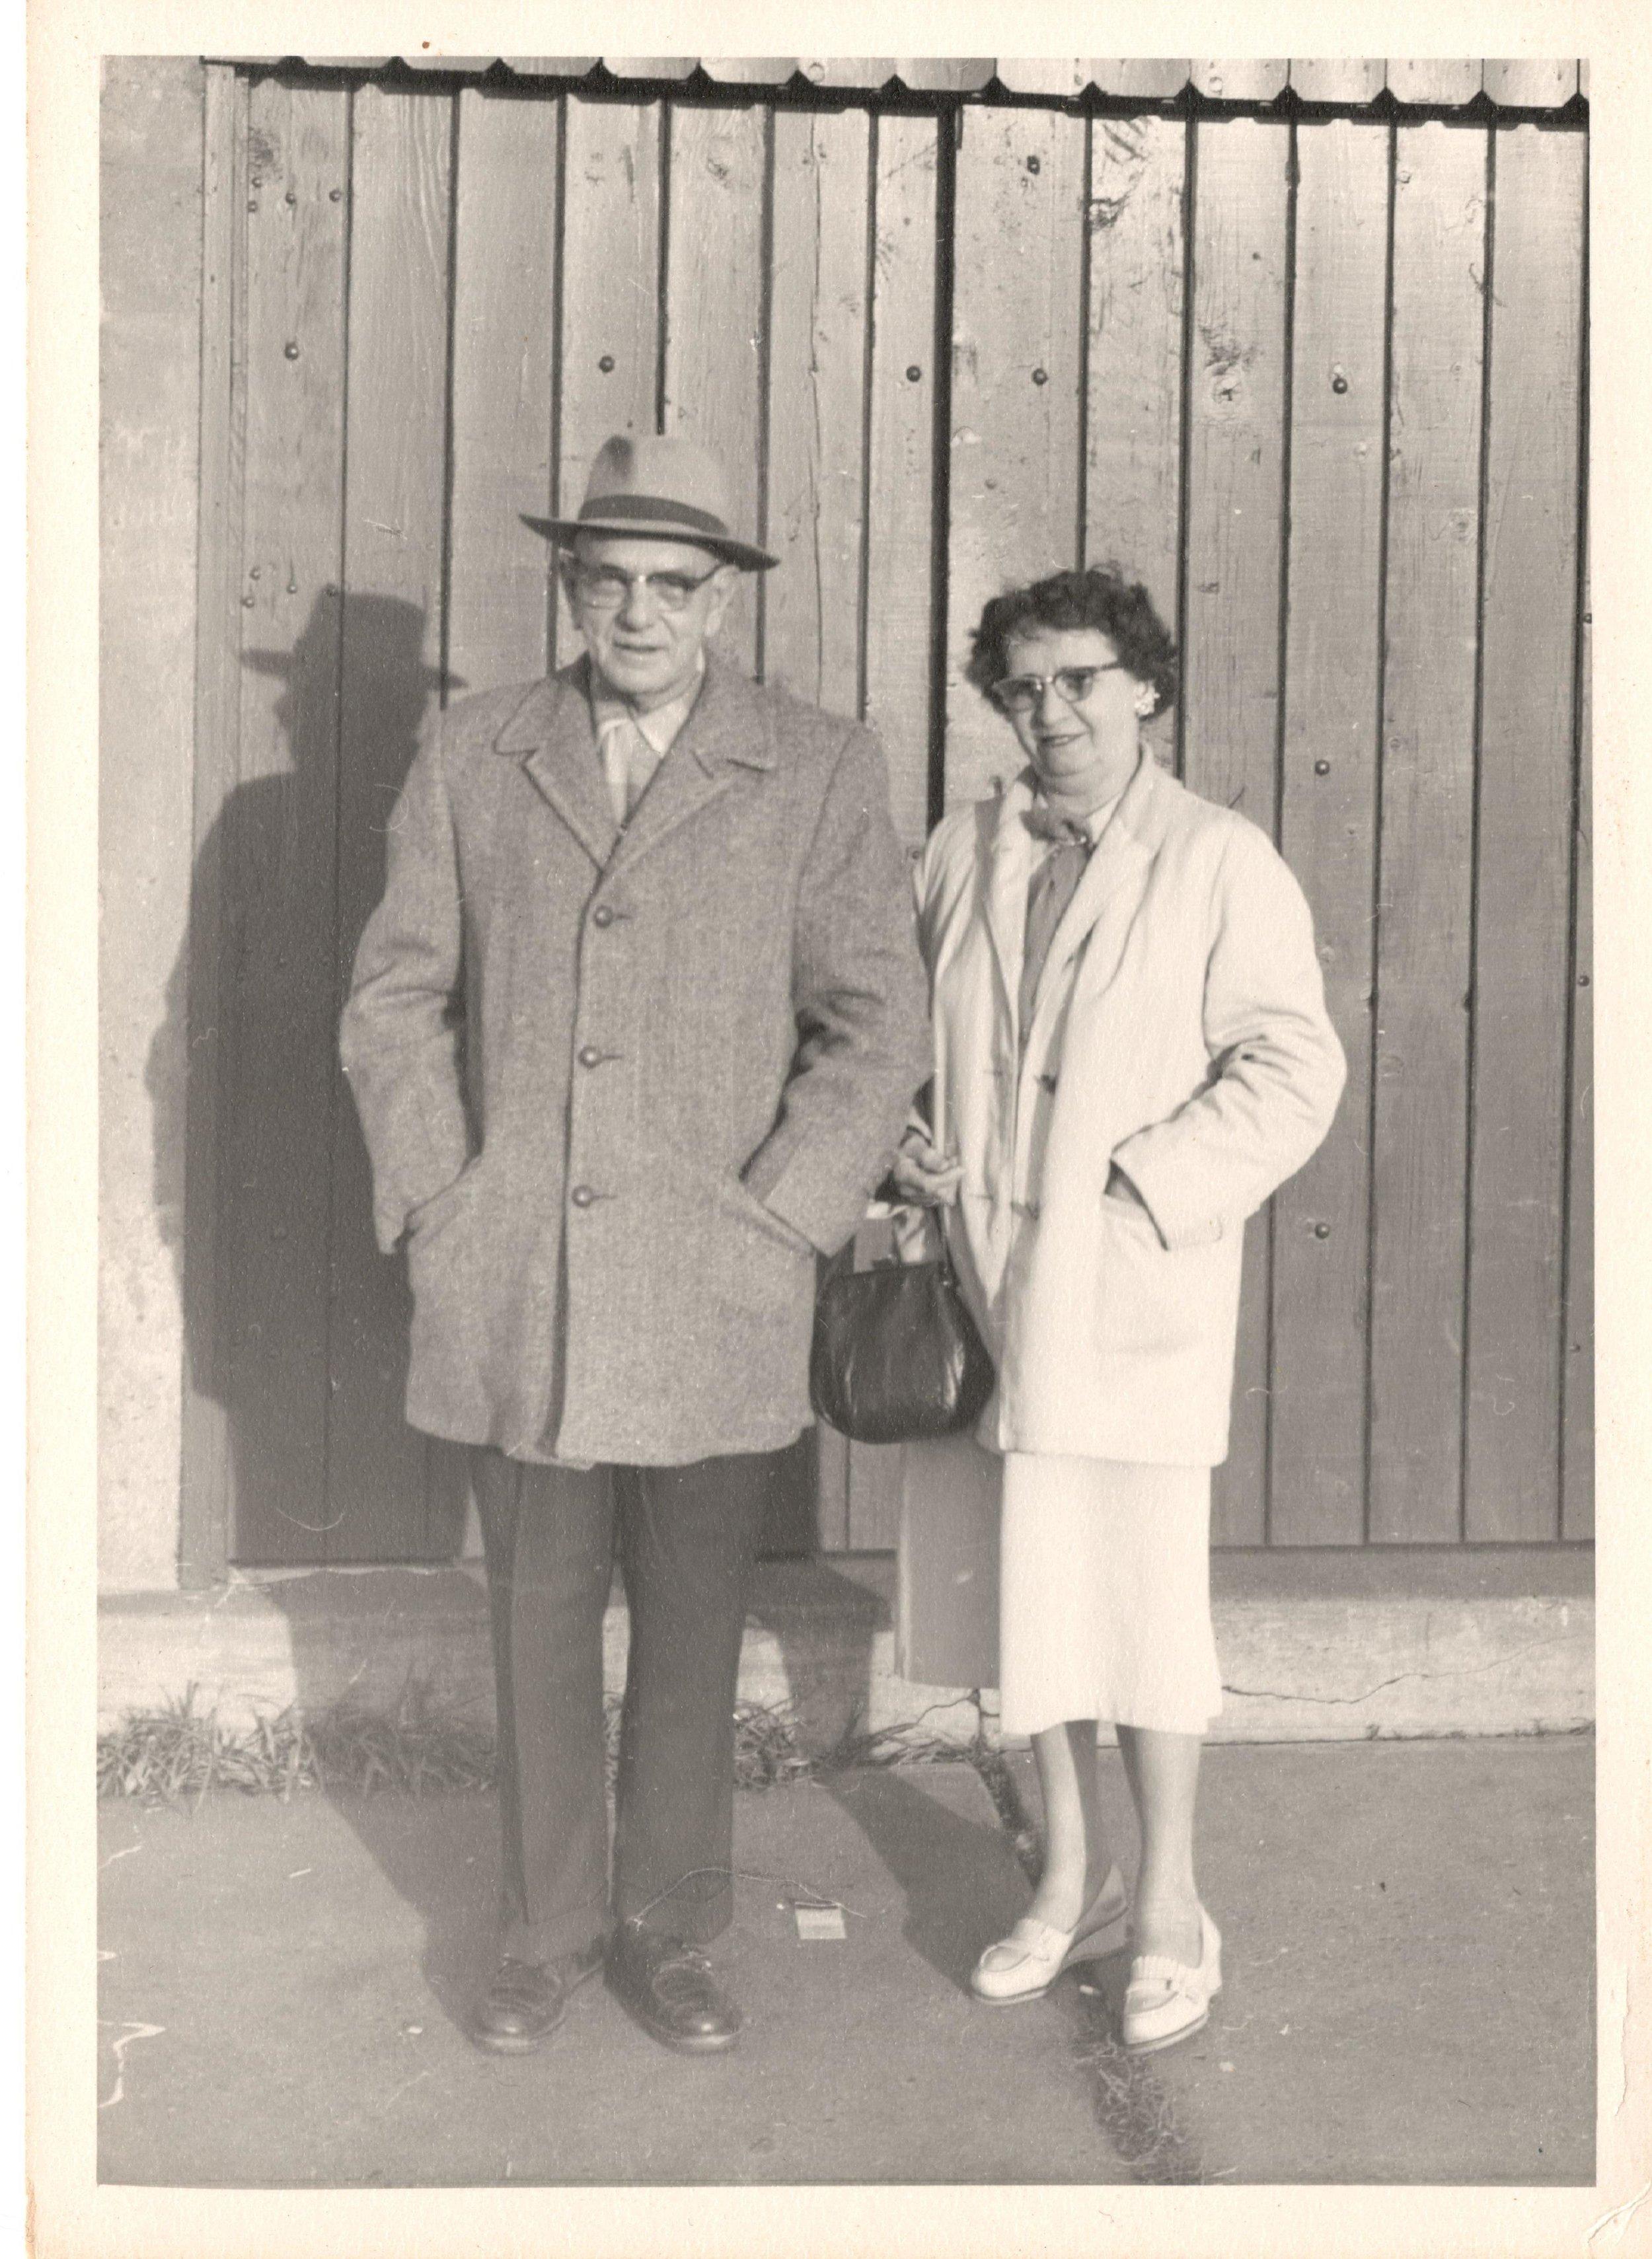 Richard Thornton and his wife Elizabeth